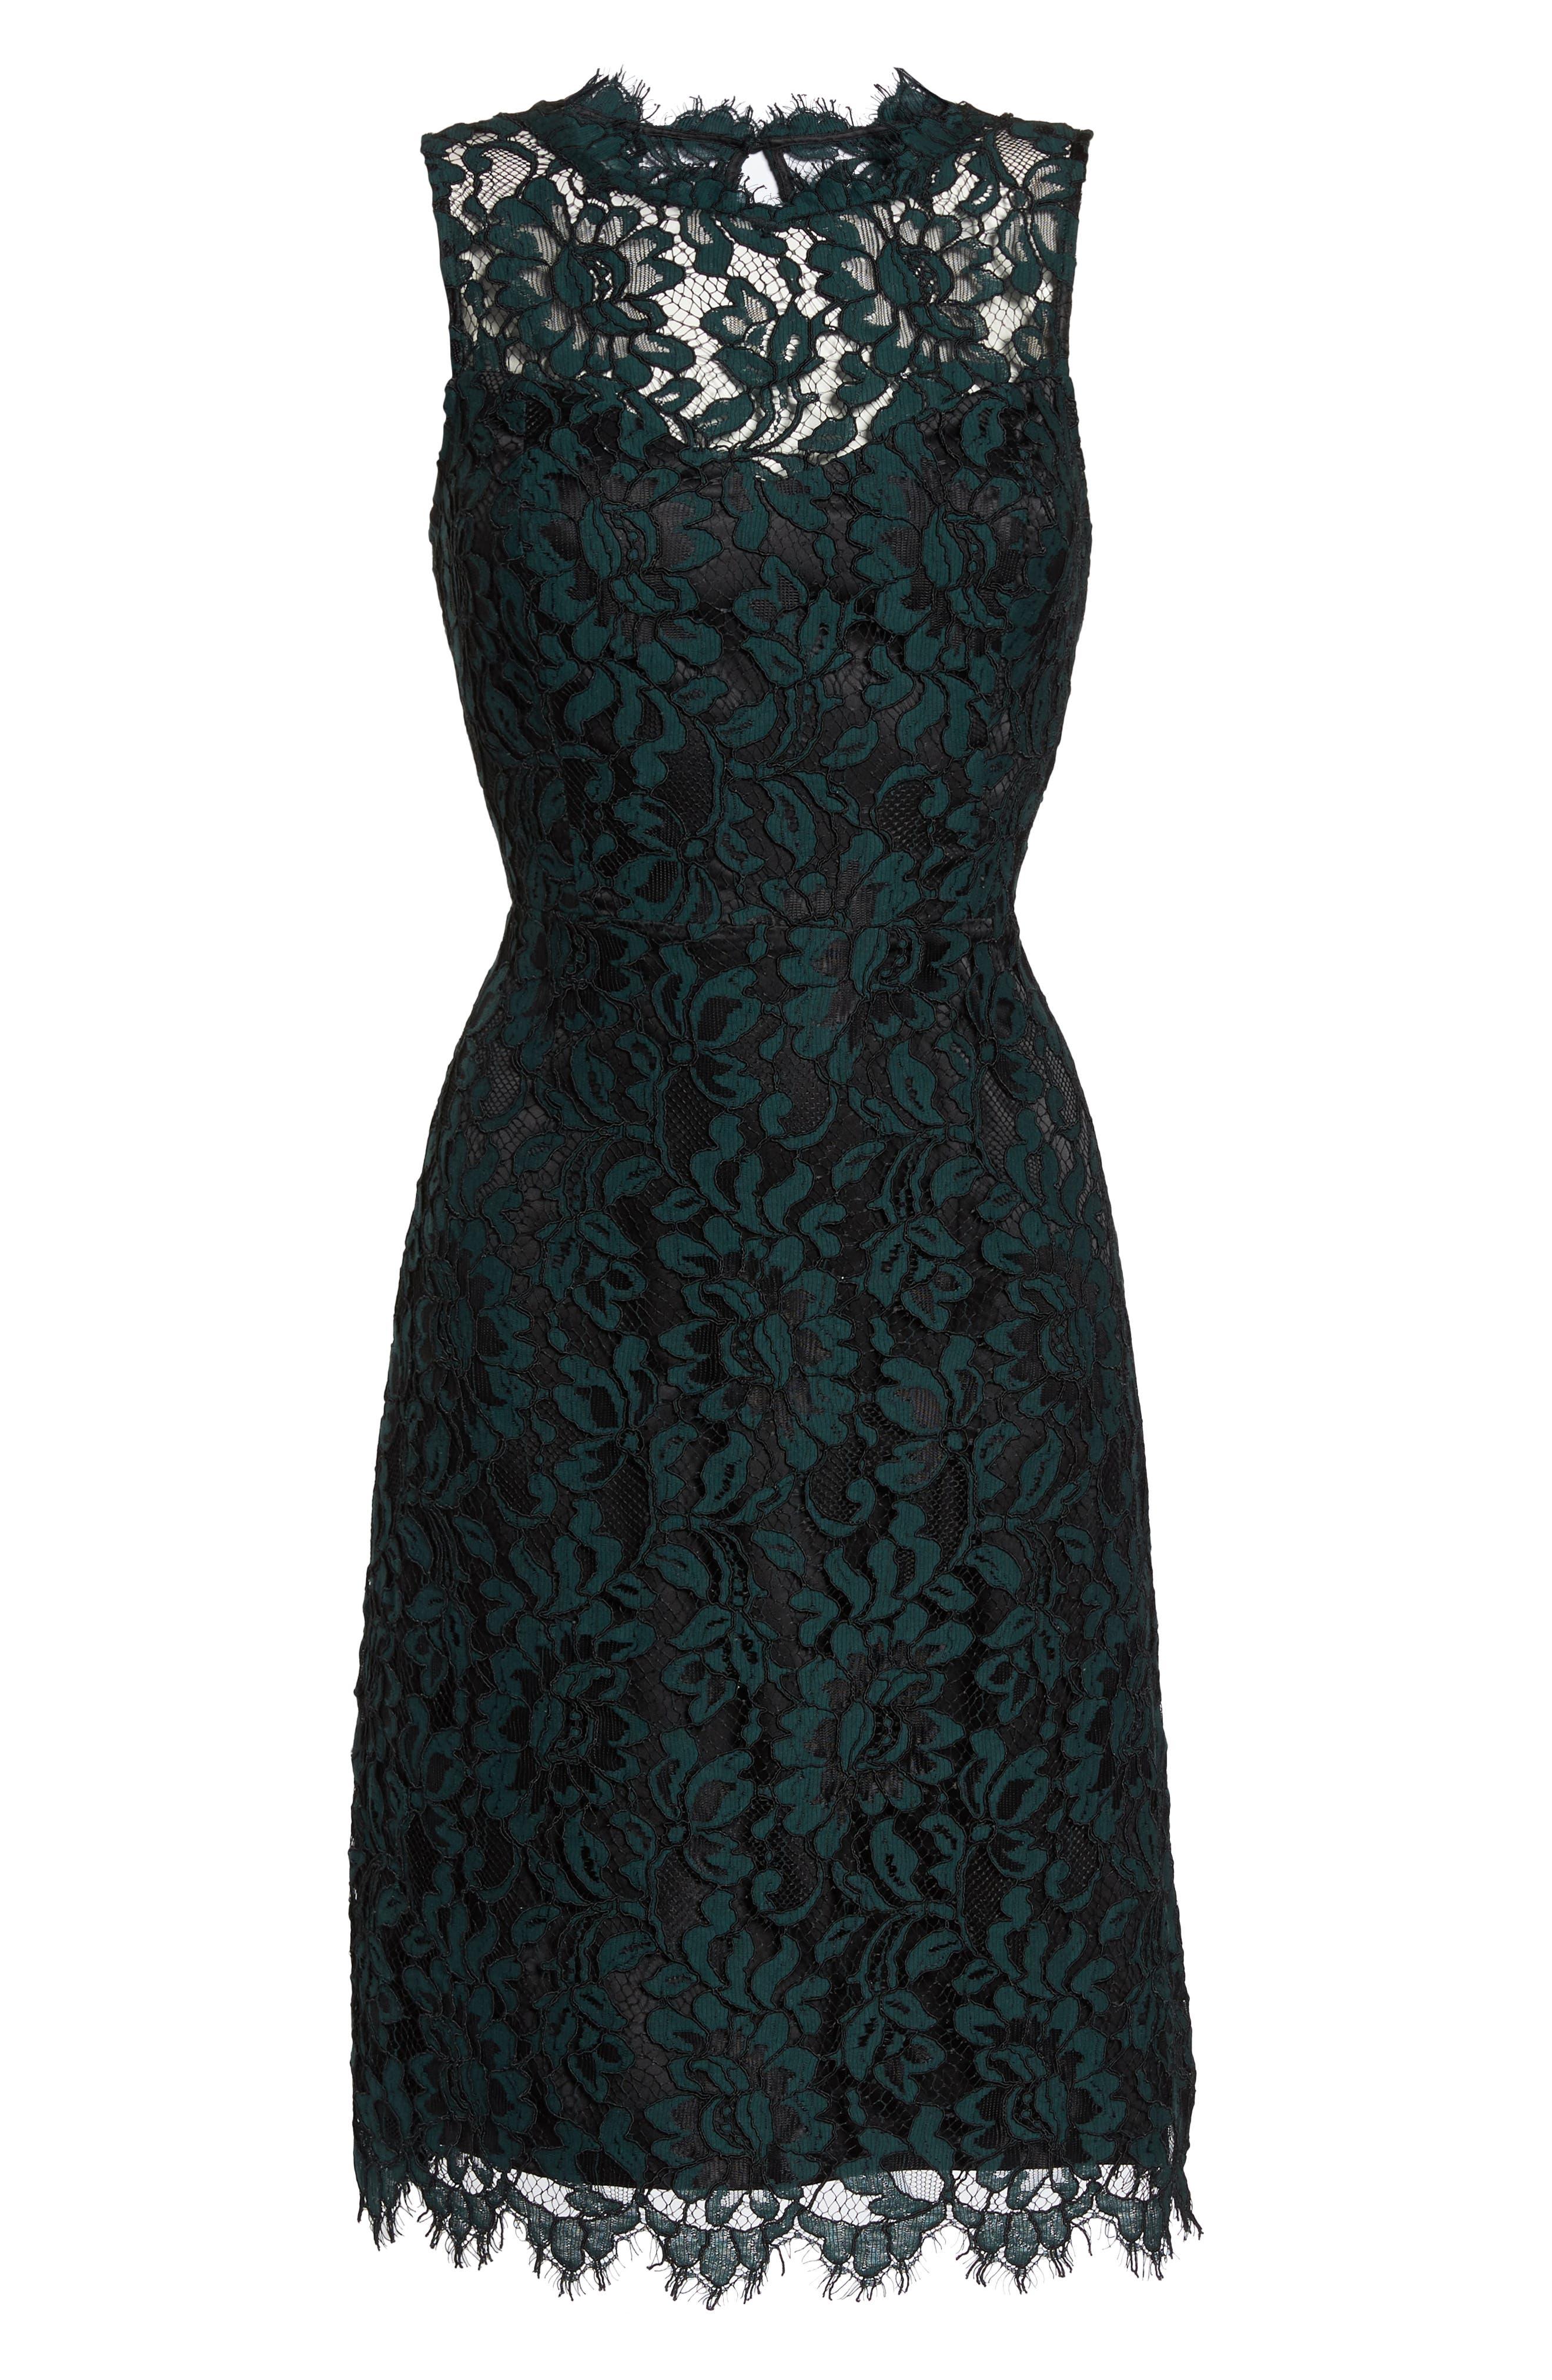 ELIZA J,                             High Neck Lace Sheath Dress,                             Alternate thumbnail 7, color,                             GREEN